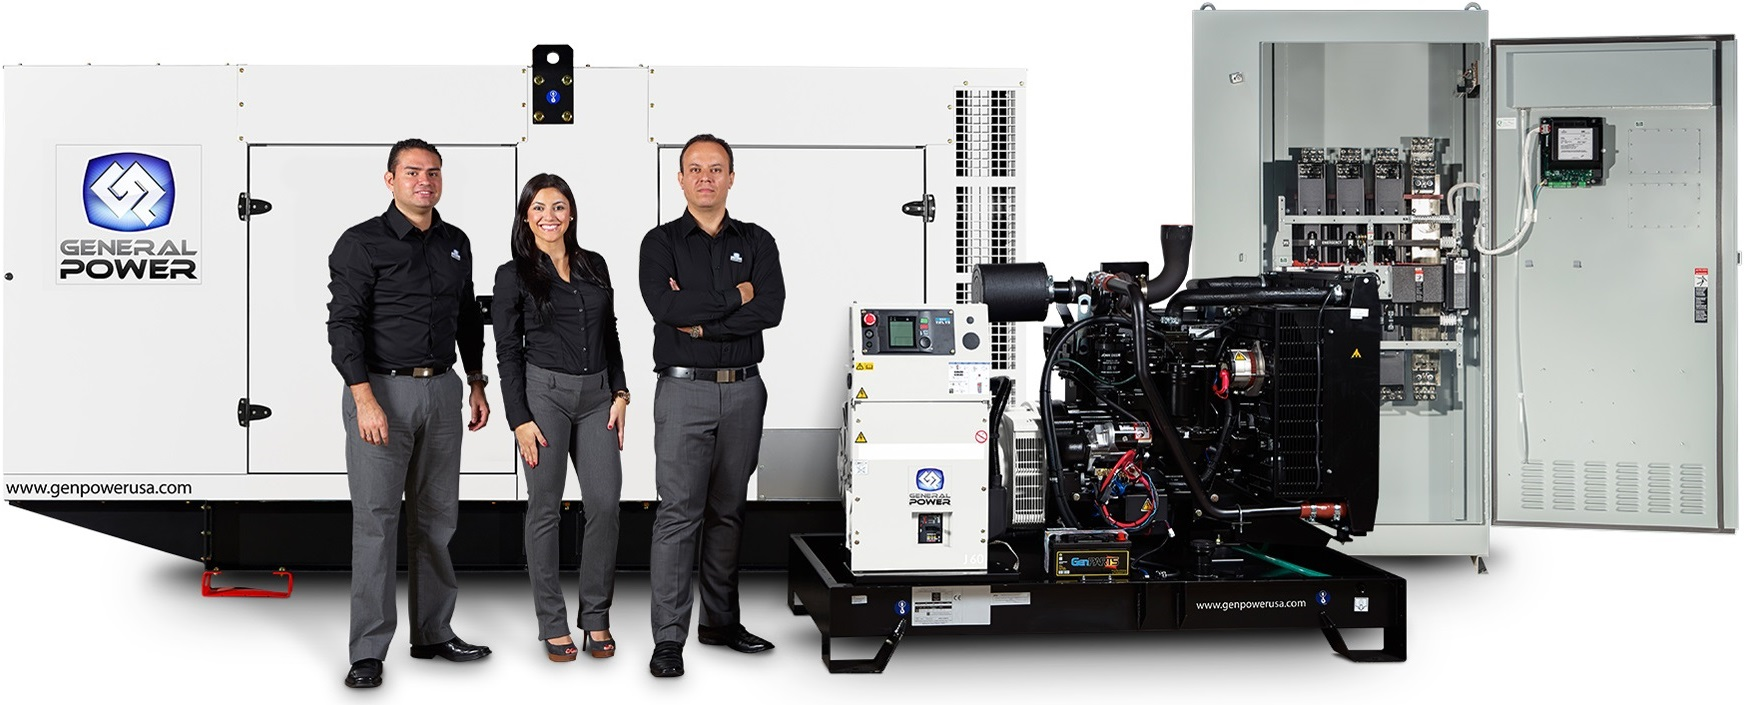 photo-diesel-generators-genpowerusa-40-kw-to-2000-kw.jpg